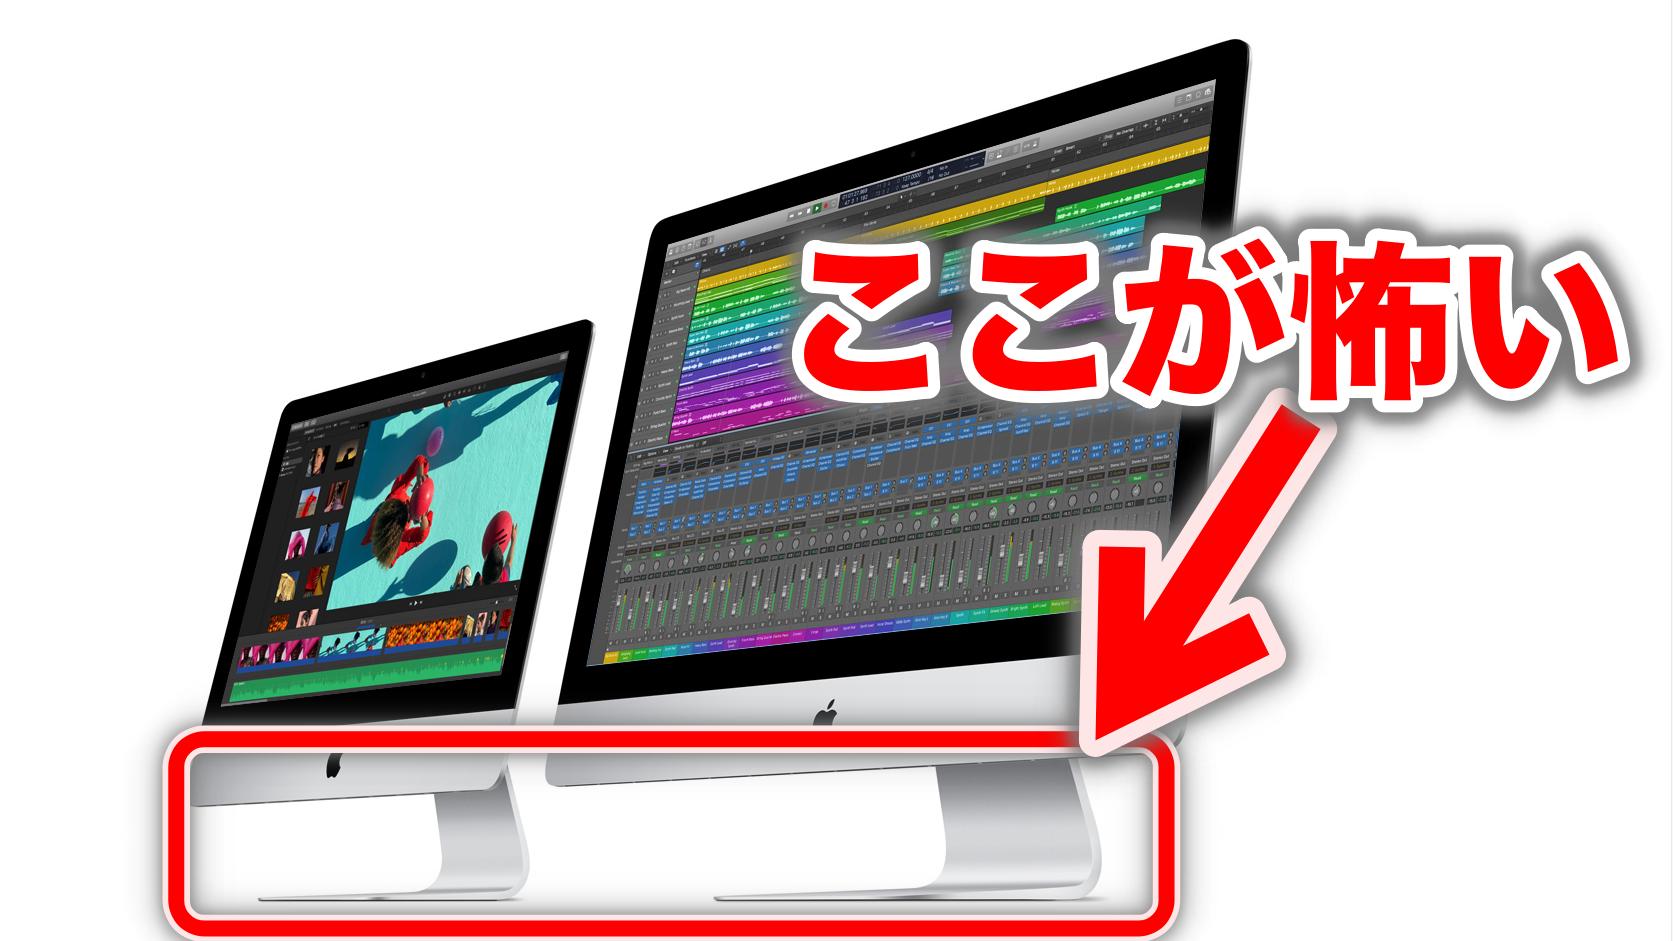 iMac Mac mini